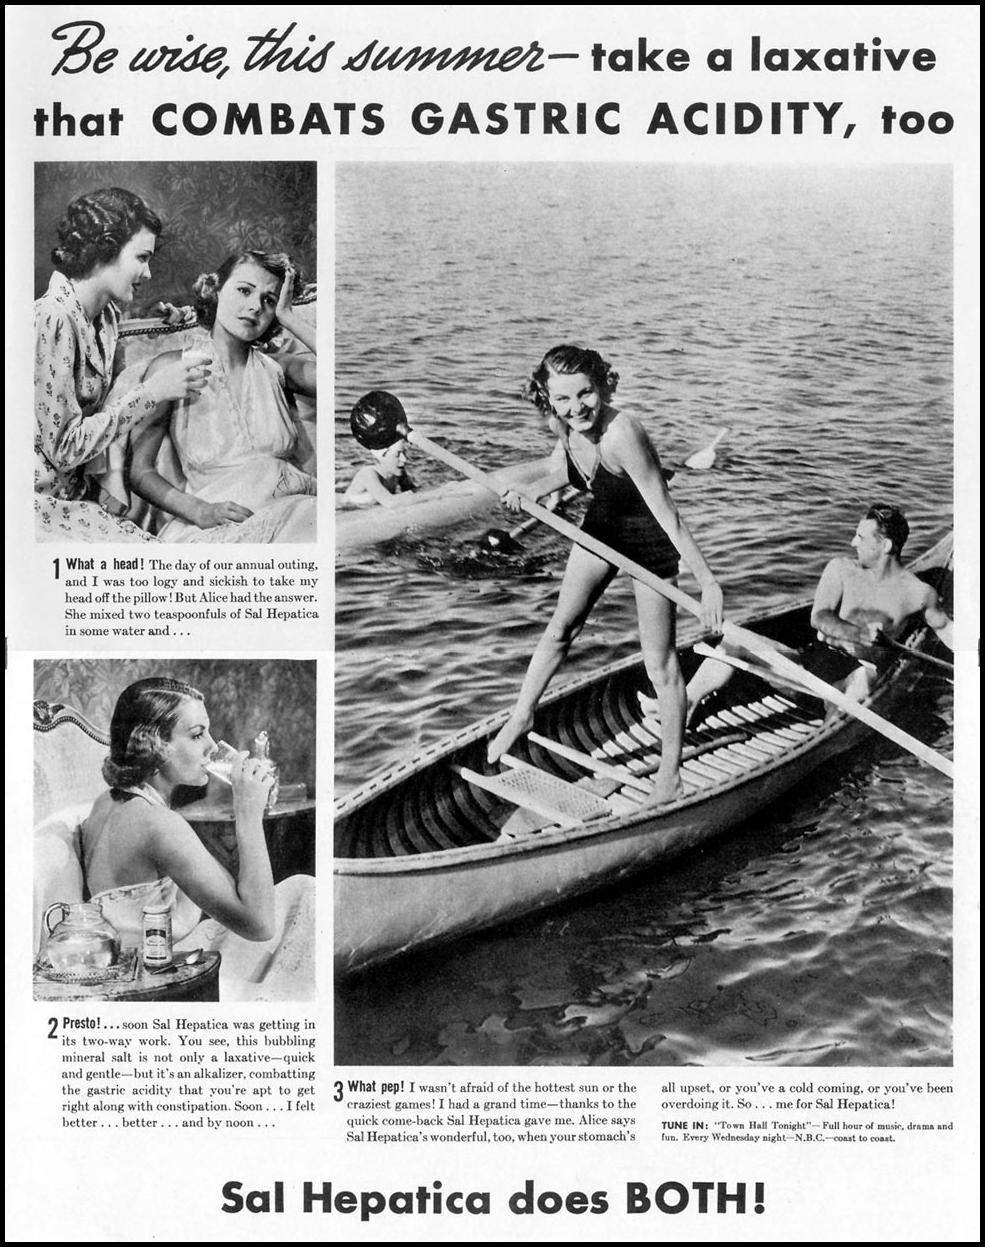 SAL HEPATICA LAXATIVE LIFE 07/26/1937 p. 1